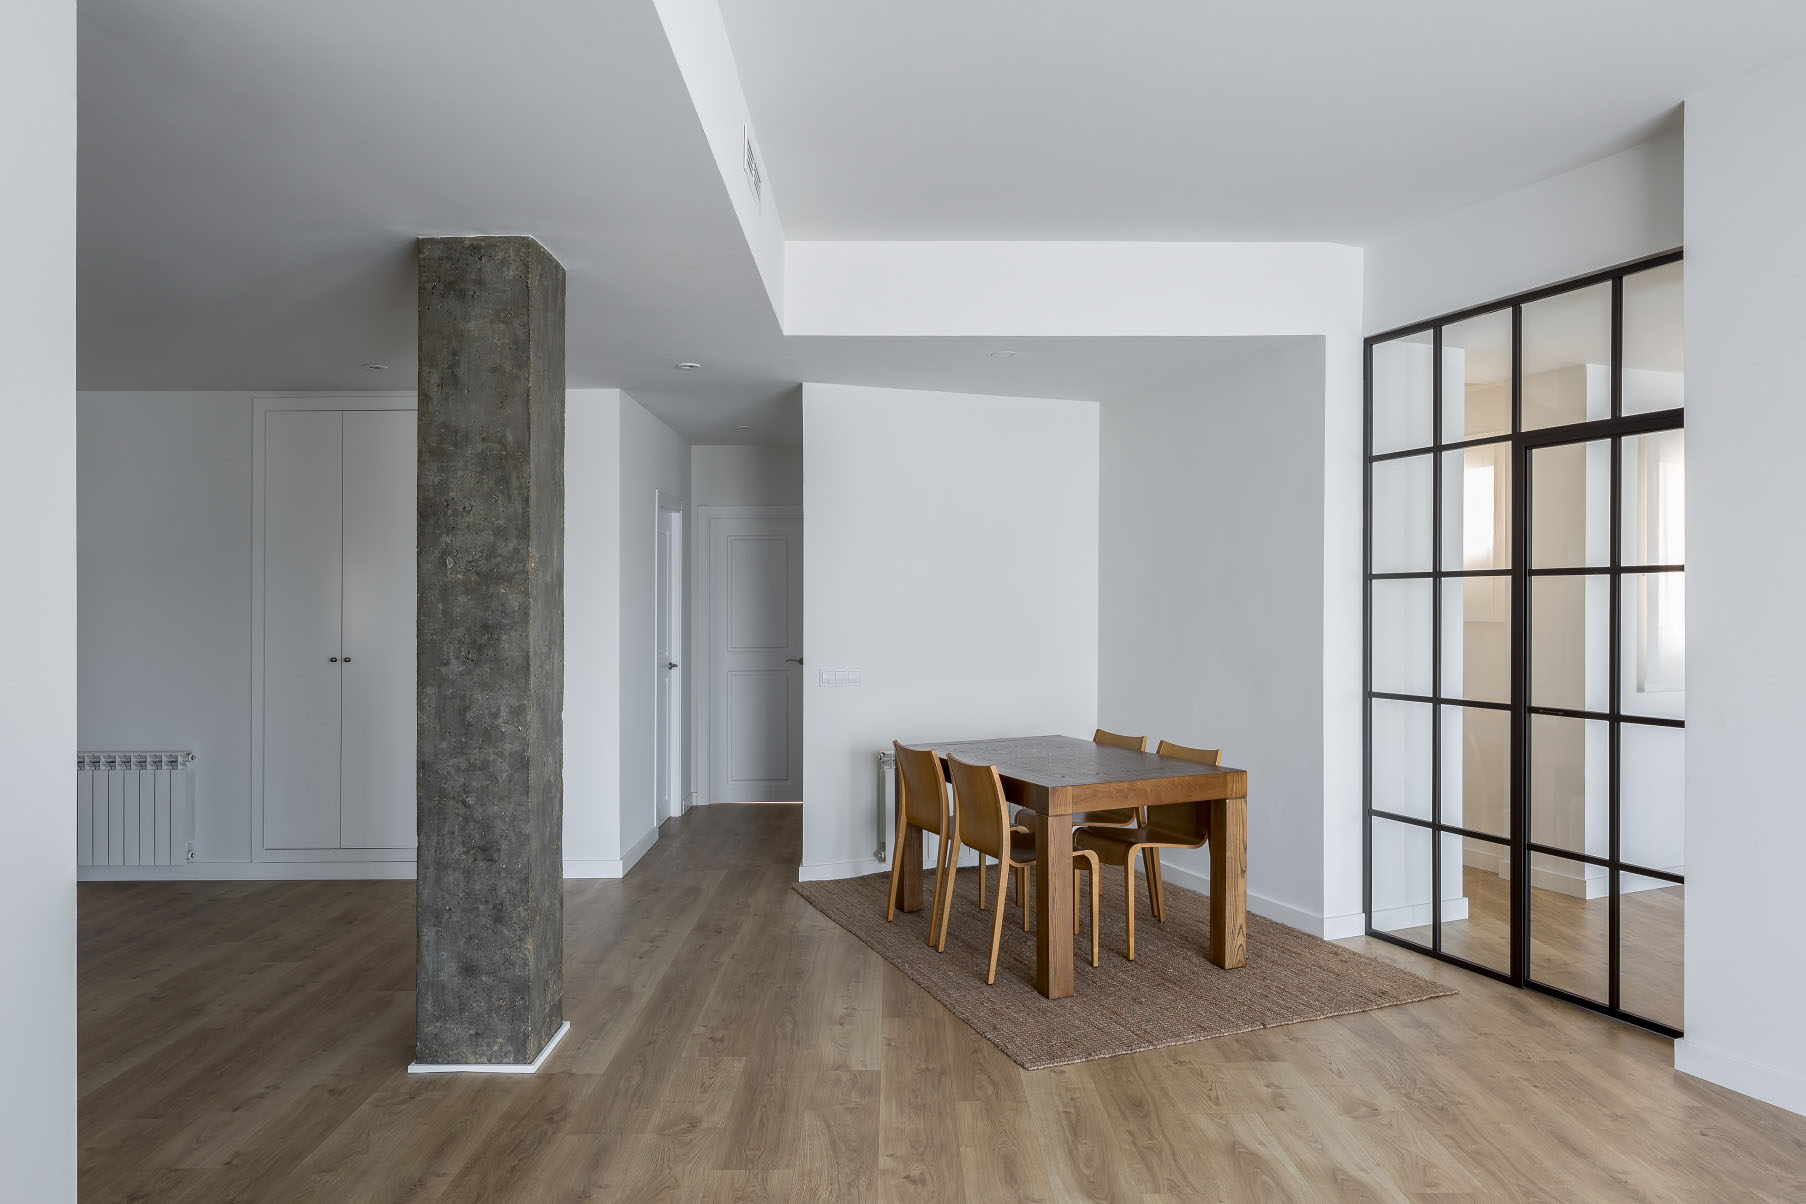 fotografia-arquitectura-valencia-german-cabo-mariola-torre-en-conill (x)_portada